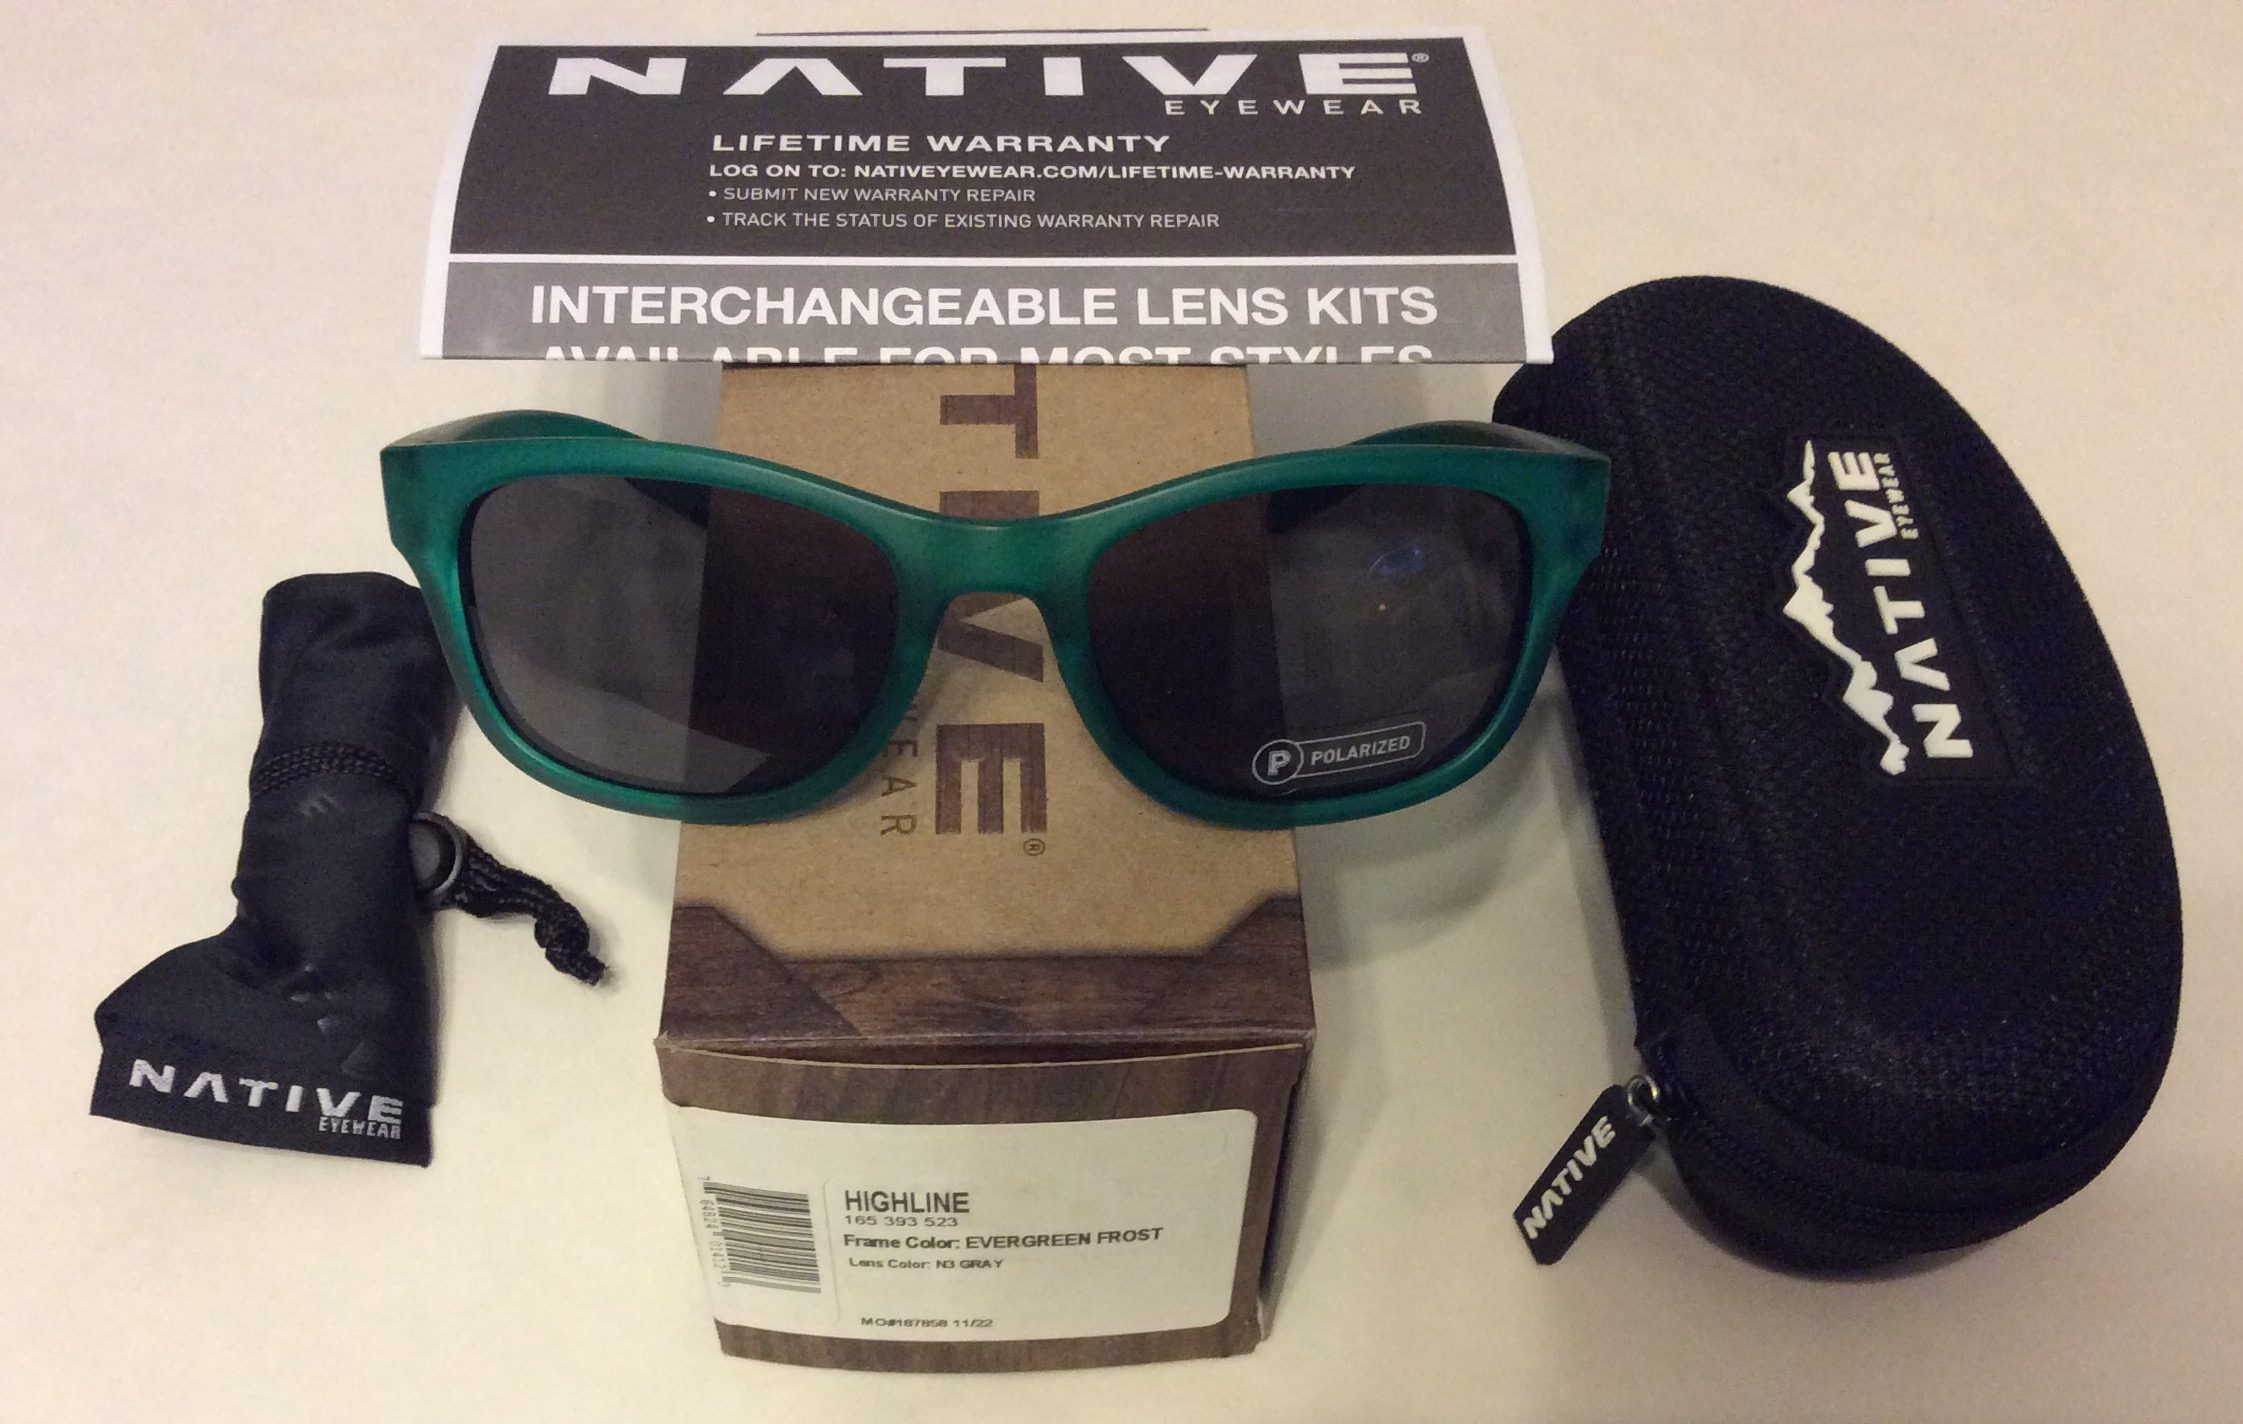 57851d9a202 Native Eyewear Dash Xr Sunglasses - Polarized